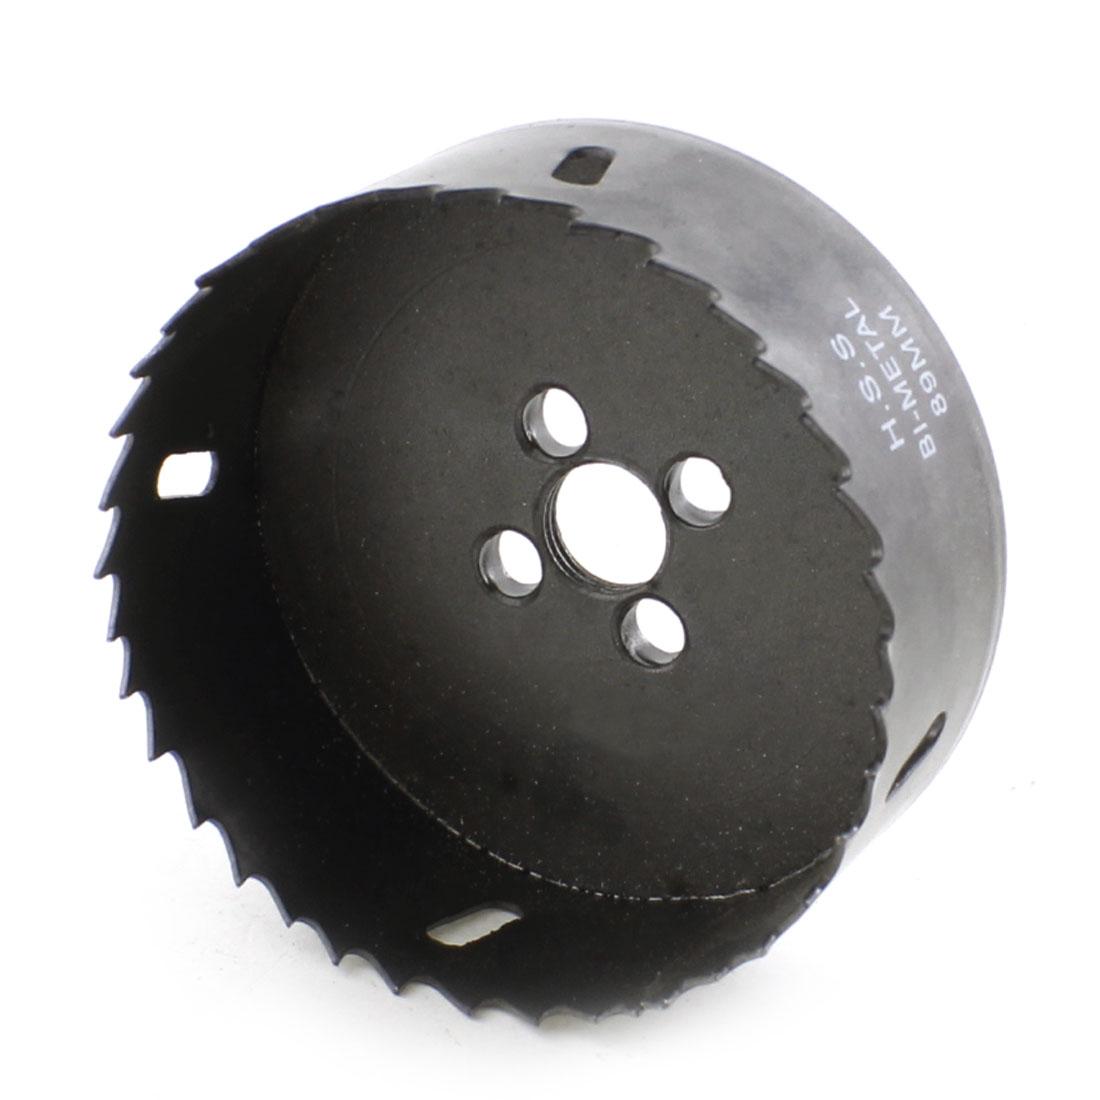 HSS 89mm Cutting Dia Wood Aluminum Alloy Cutting Tool Bimetal Hole Saw